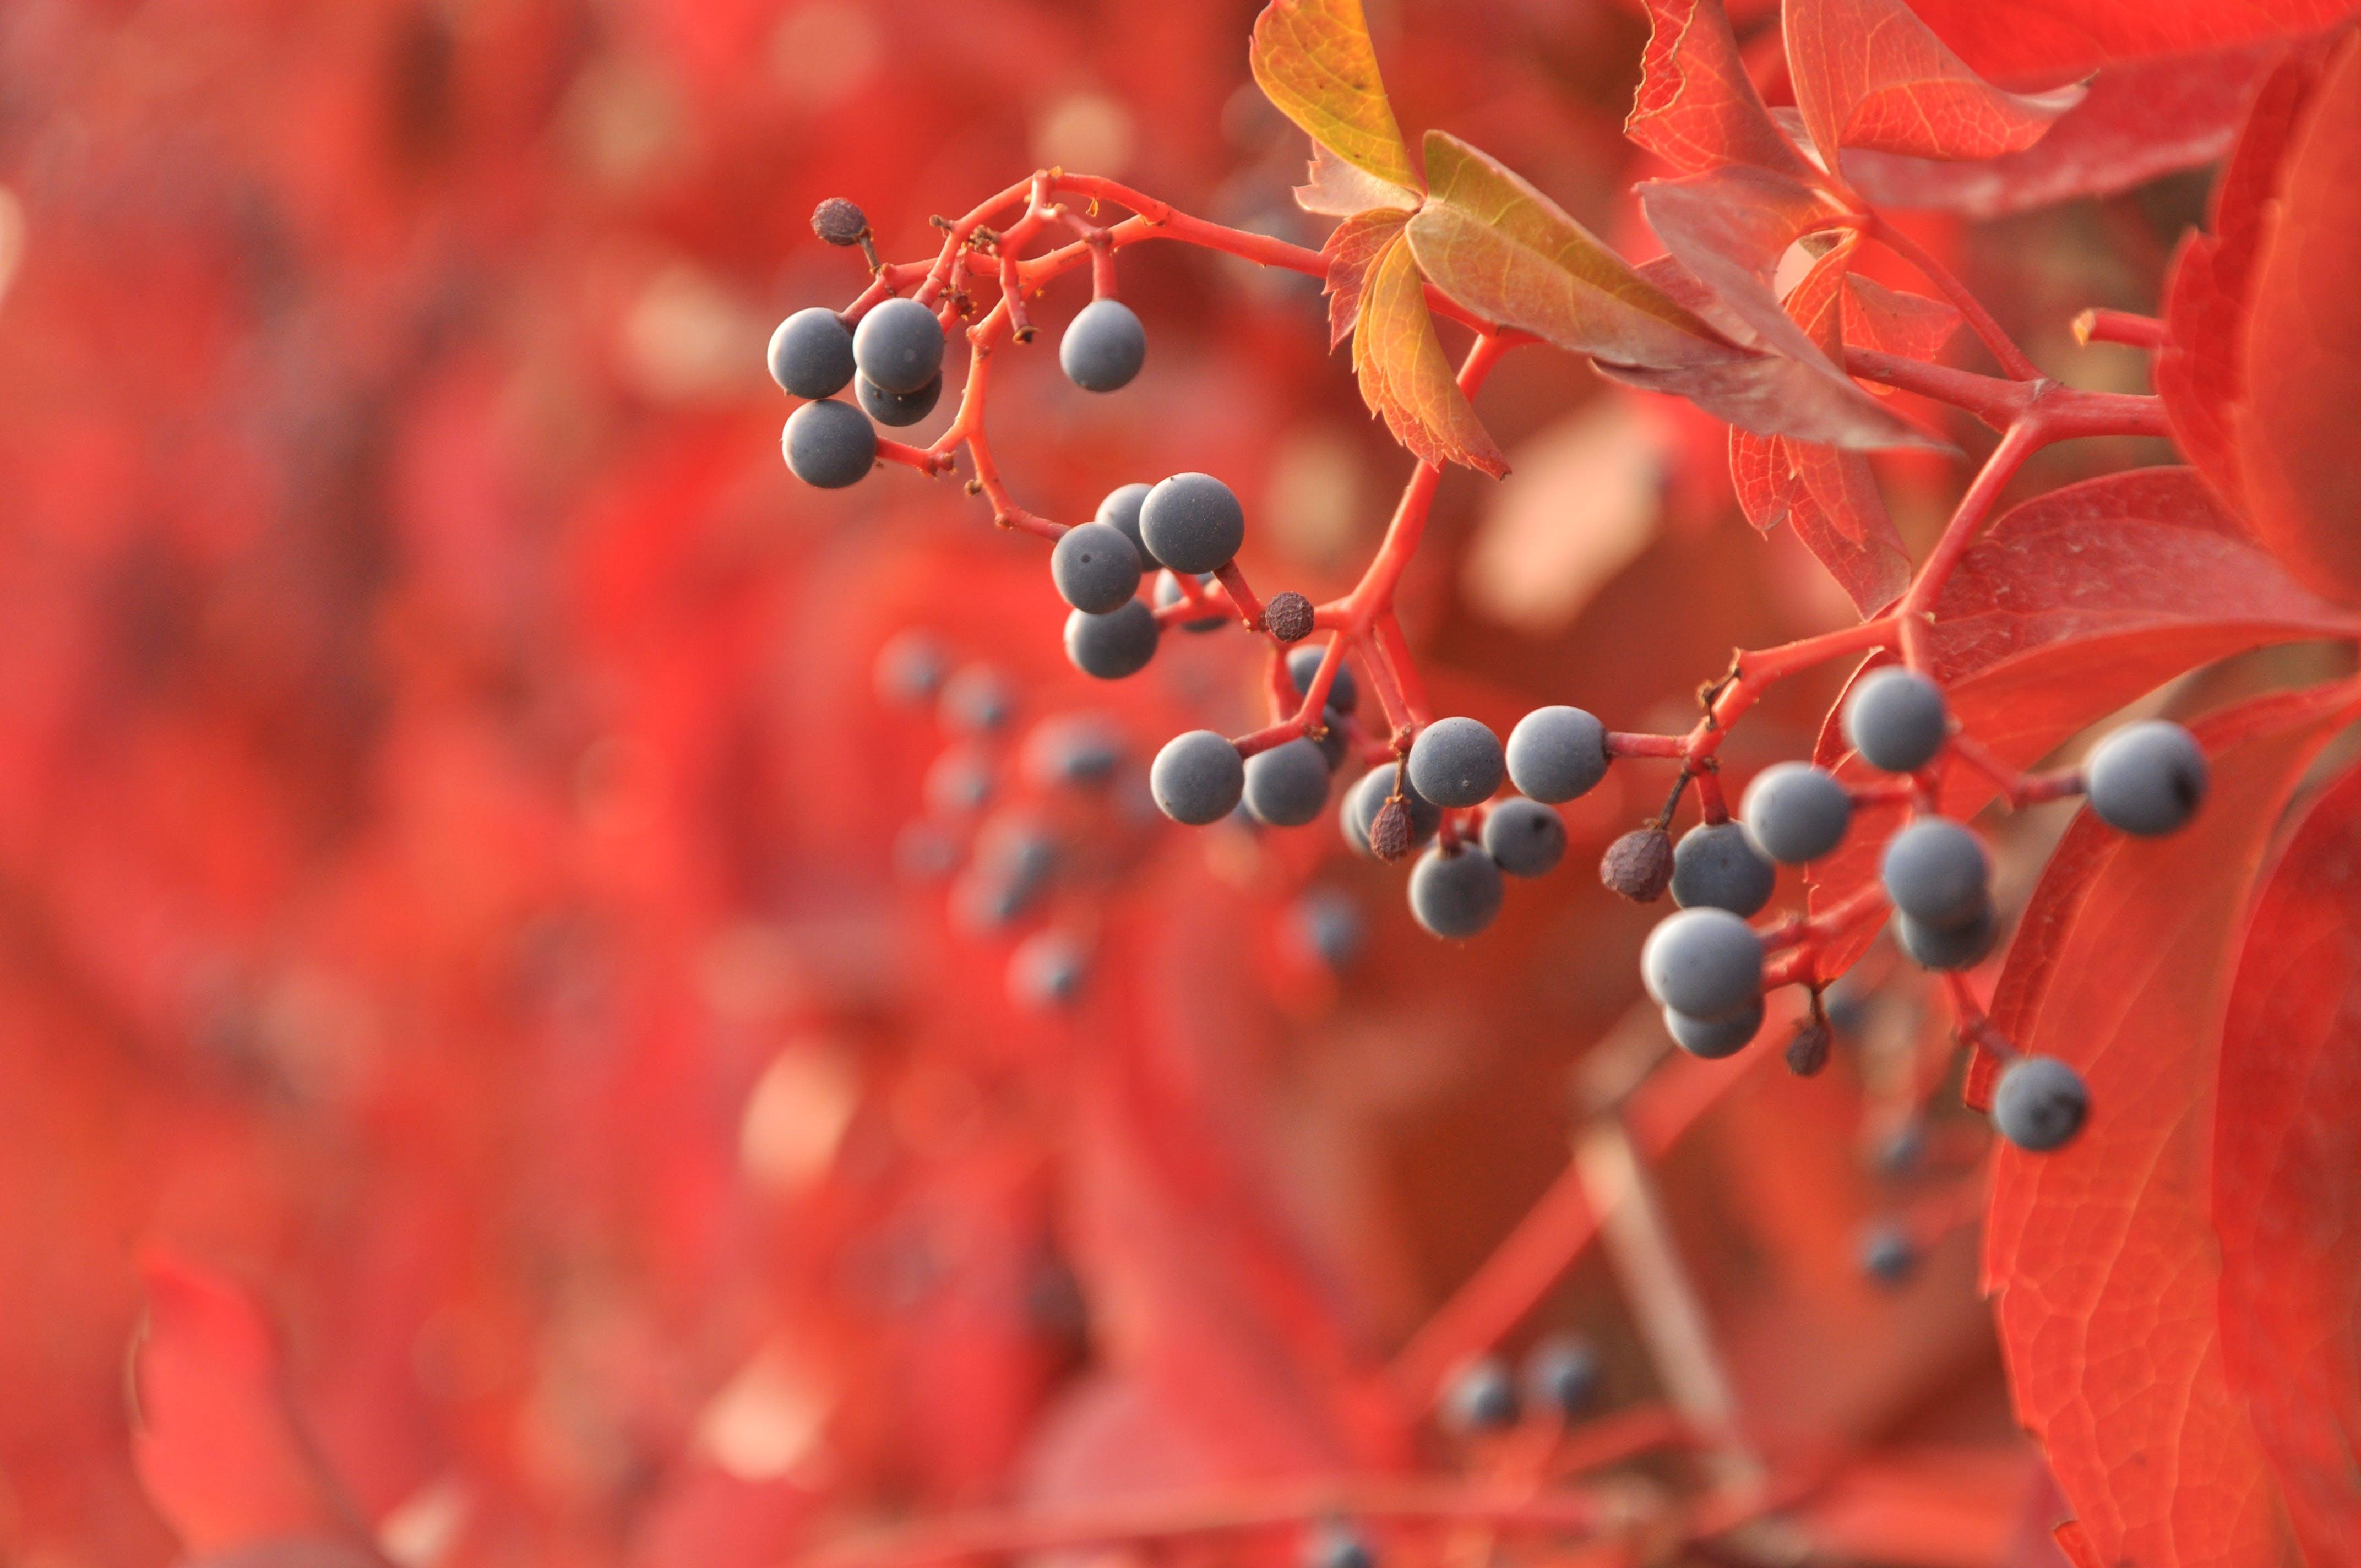 Selective Focus Photograph of Gray Fruit